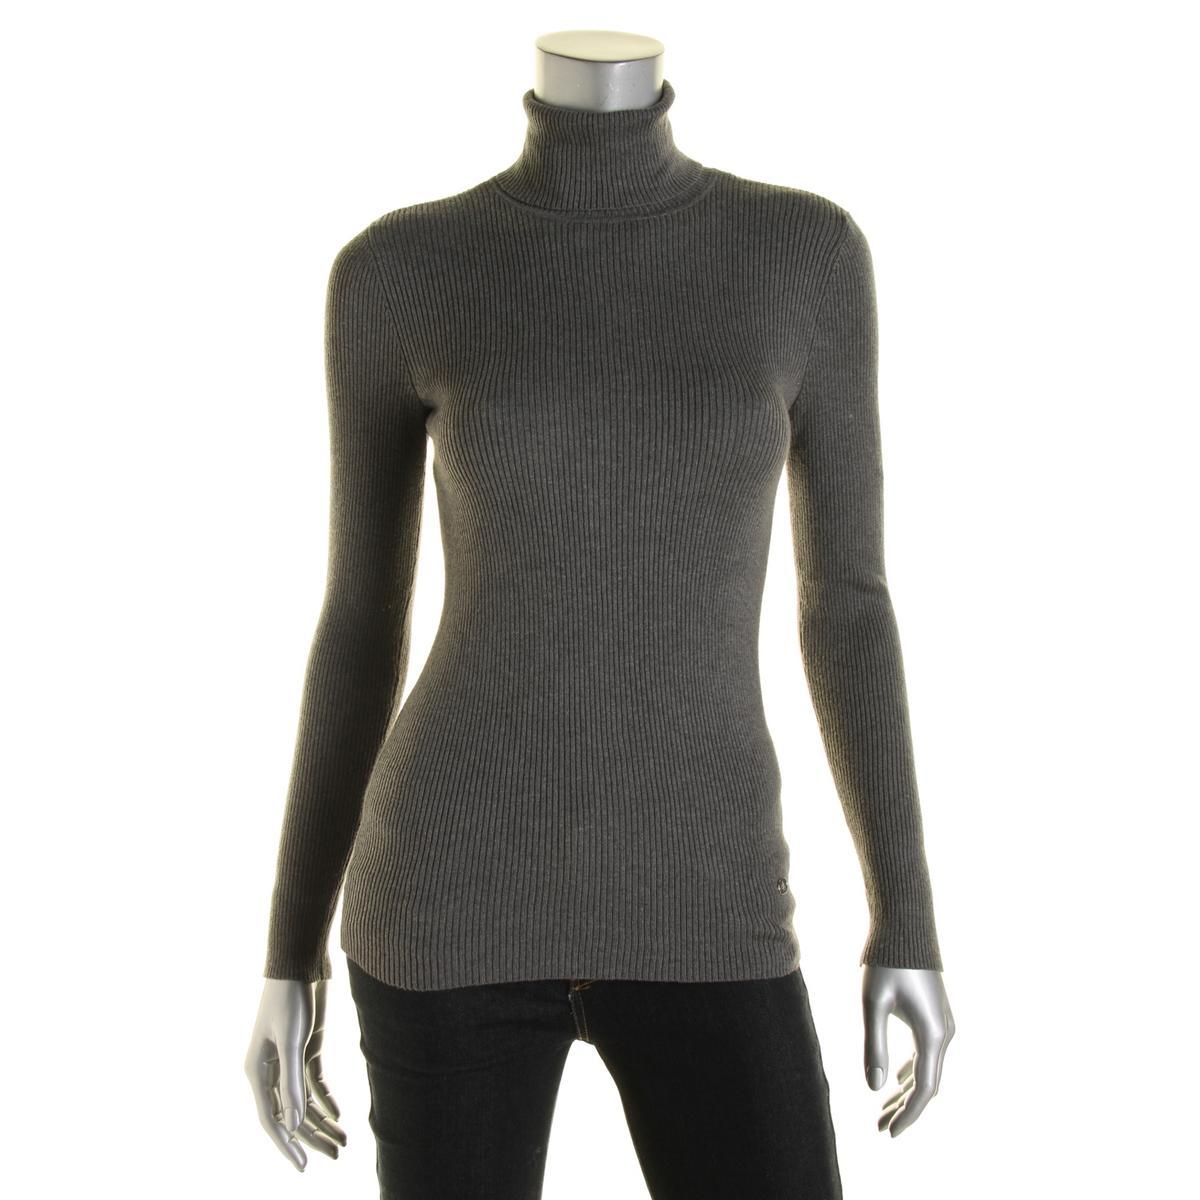 lauren ralph lauren 4191 womens gray ribbed knit pullover sweater top xs bhfo ebay. Black Bedroom Furniture Sets. Home Design Ideas